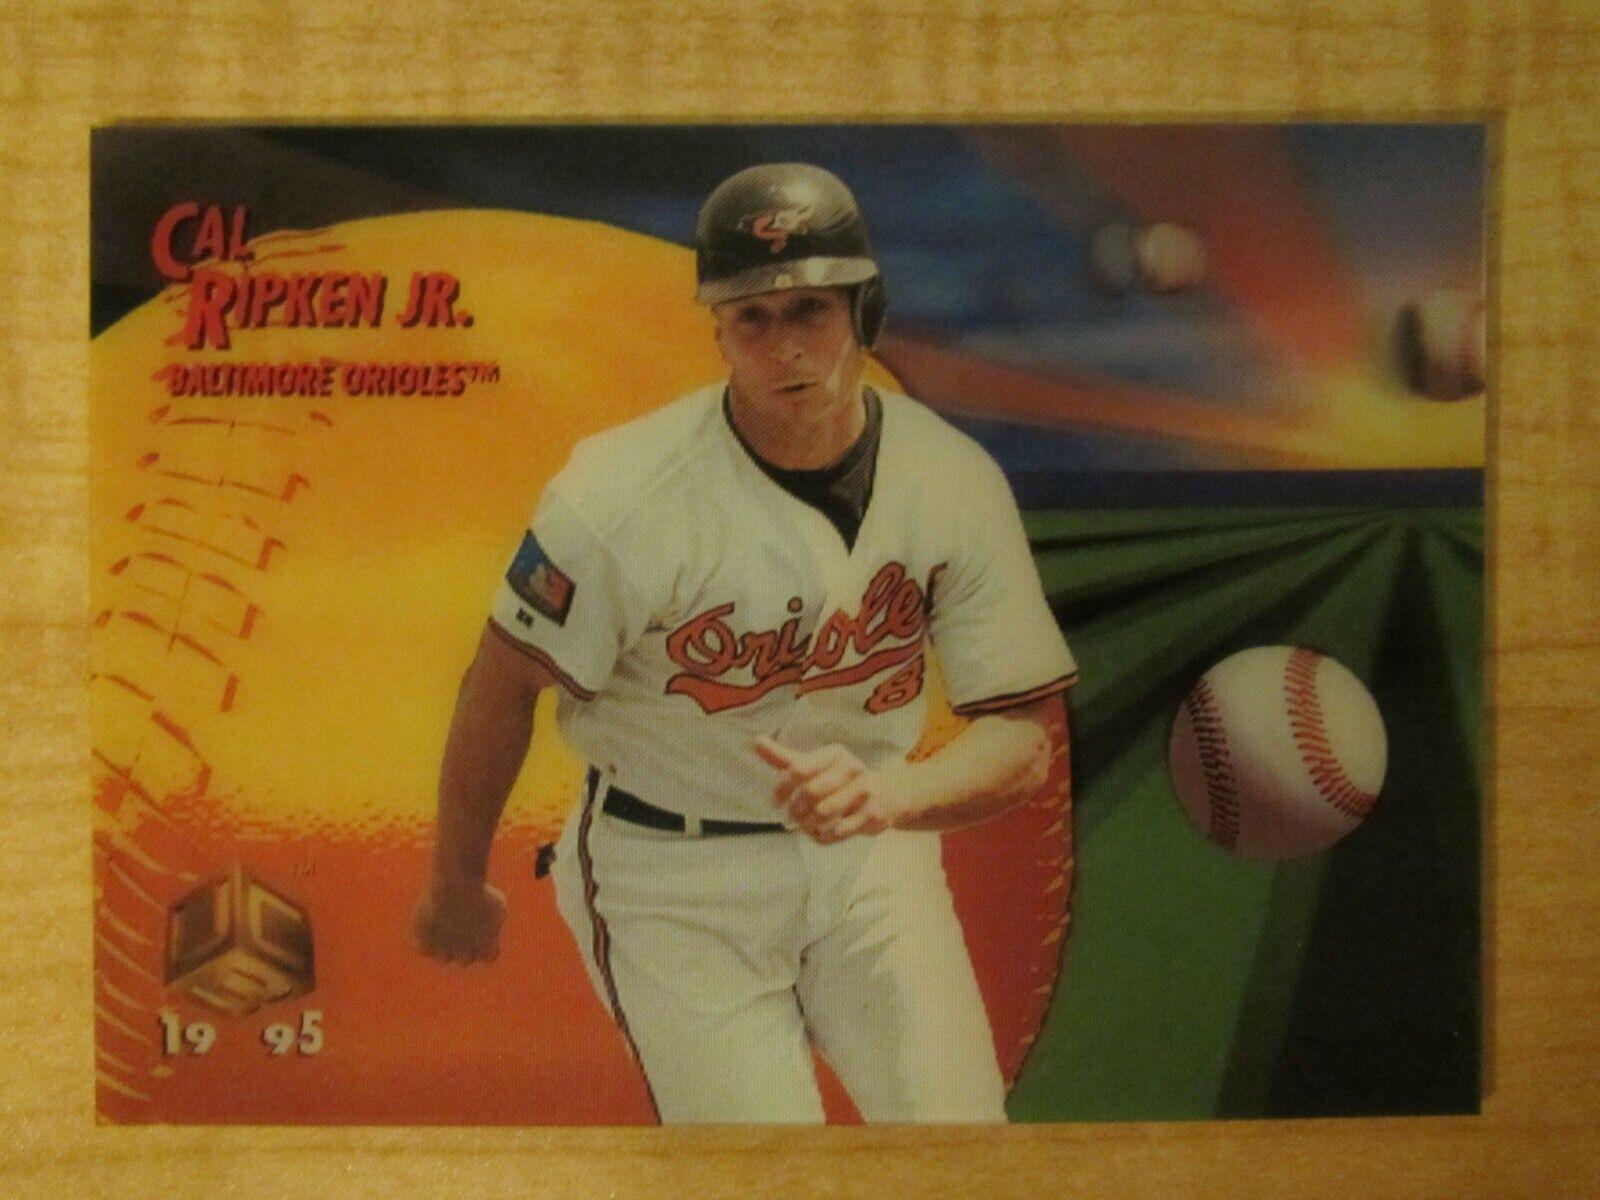 1995 Pinnacle Sportflix UC3 Cal Ripken Jr 75 Baltimore Orioles HOF - $1.99